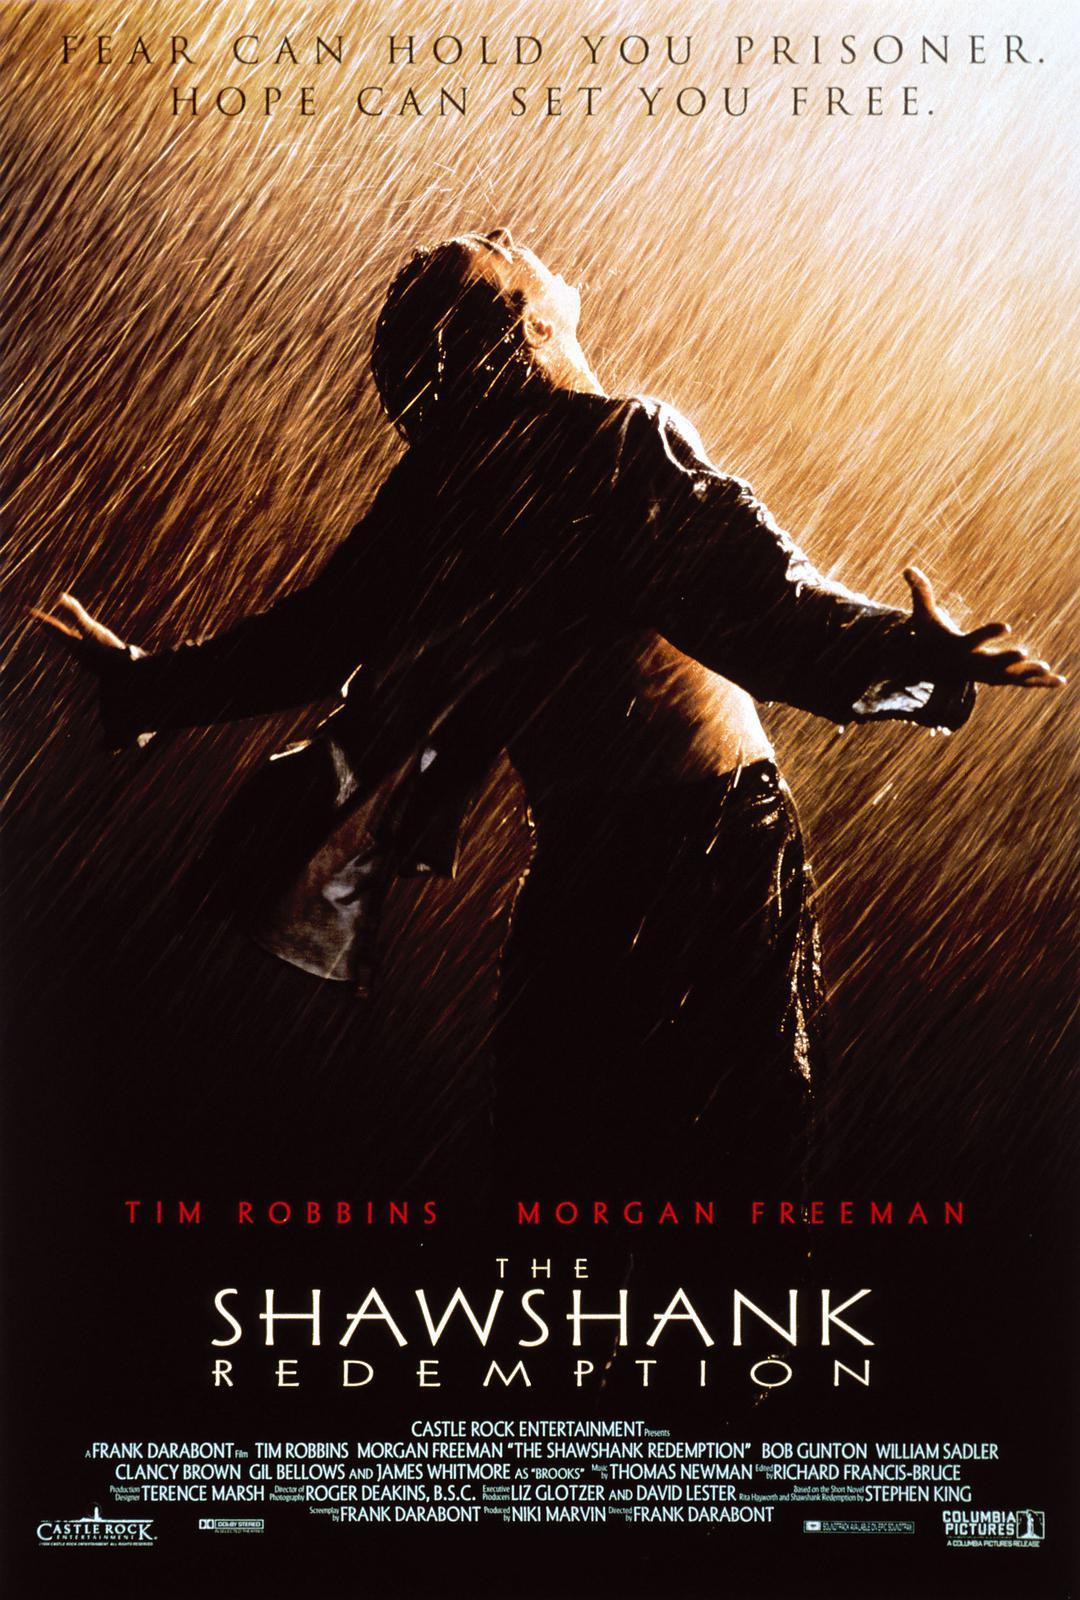 悠悠MP4_MP4电影下载_肖申克的救赎/刺激1995 The.Shawshank.Redemption.1994.2160p.BluRay.REMUX.HEVC.DTS-HD.MA.5.